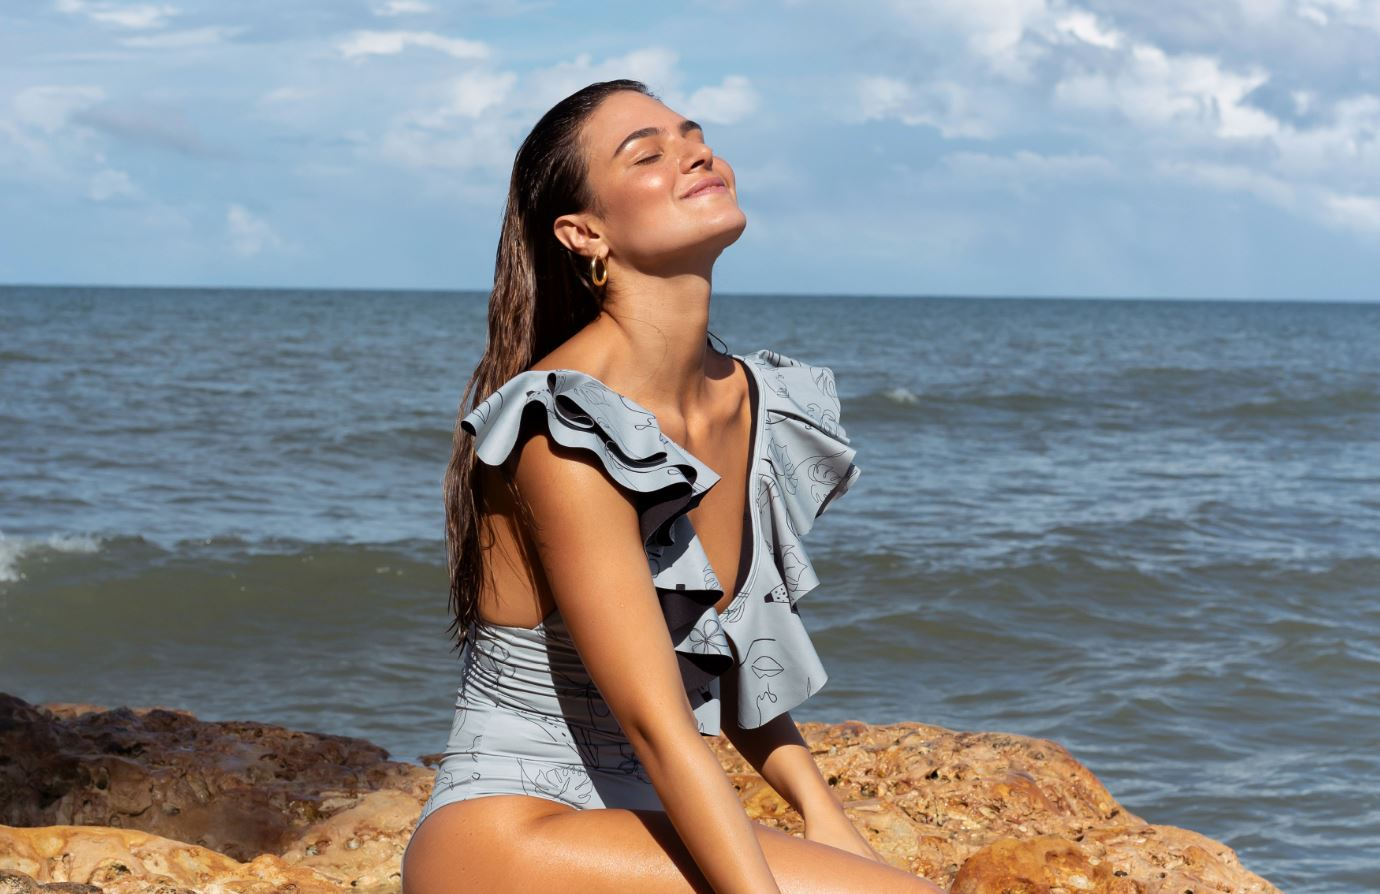 Plaza Fontabella y Bikini Town le dan la bienvenida al verano